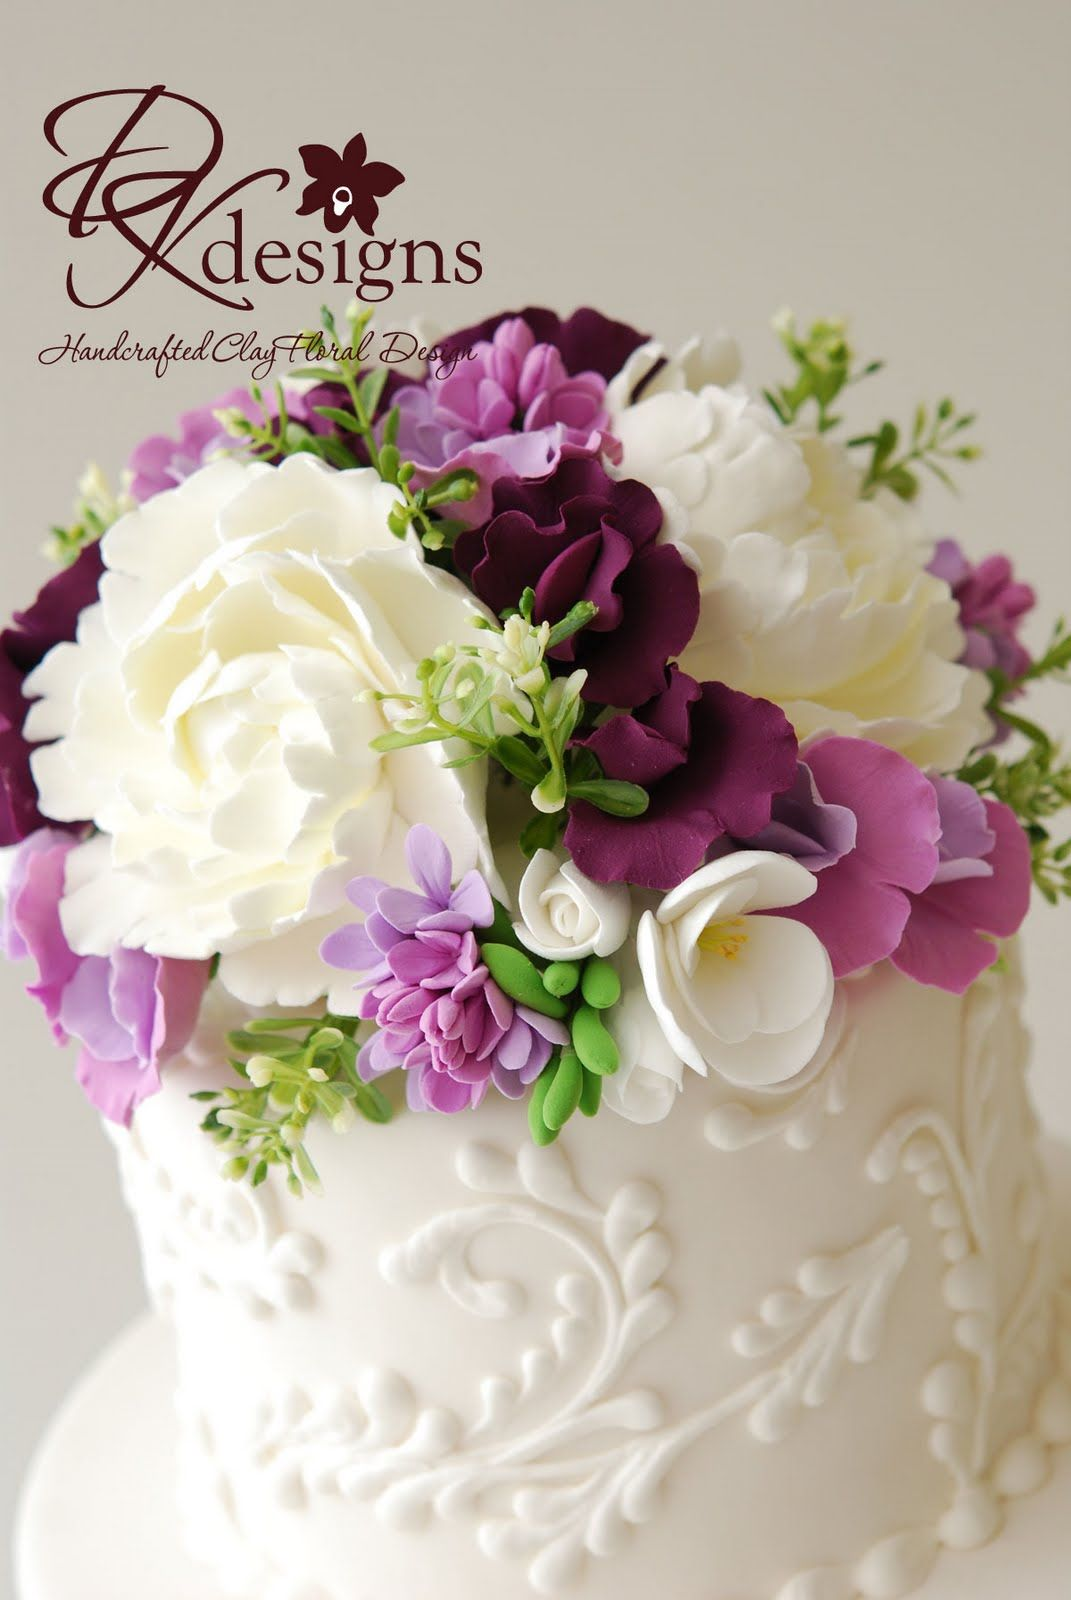 Image detail for -DK Designs: More Custom Cake Toppers...